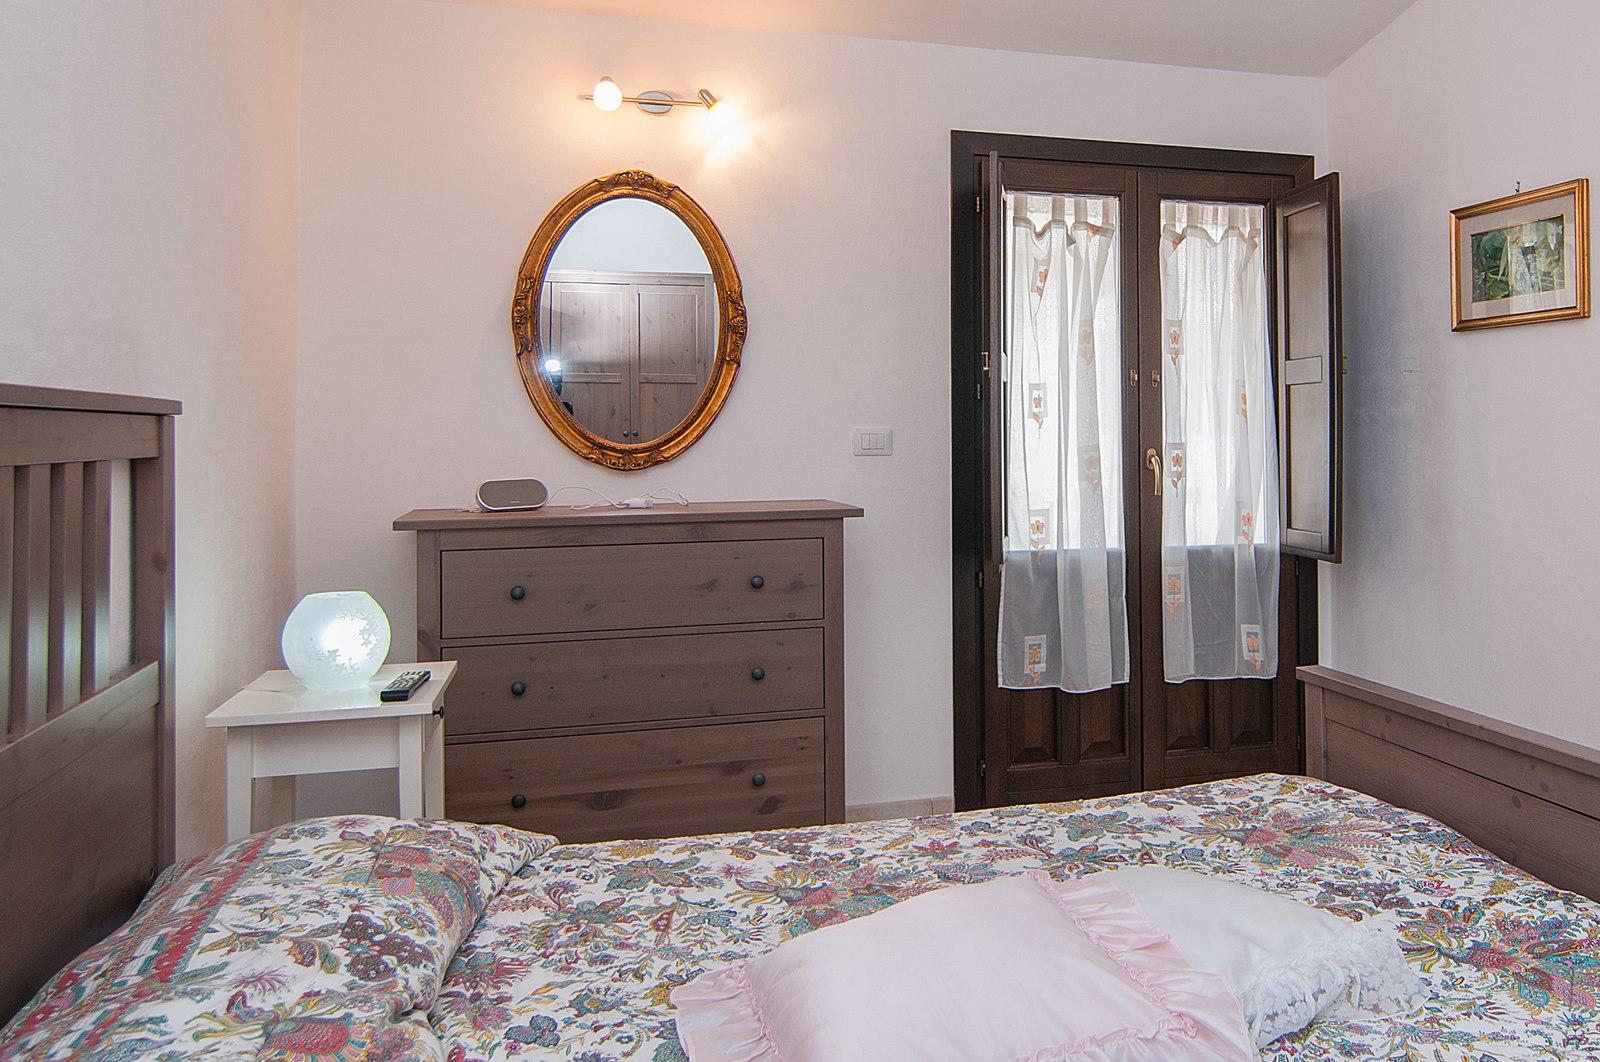 Appartement de vacances Casa Corrado (1540085), Avola, Siracusa, Sicile, Italie, image 11